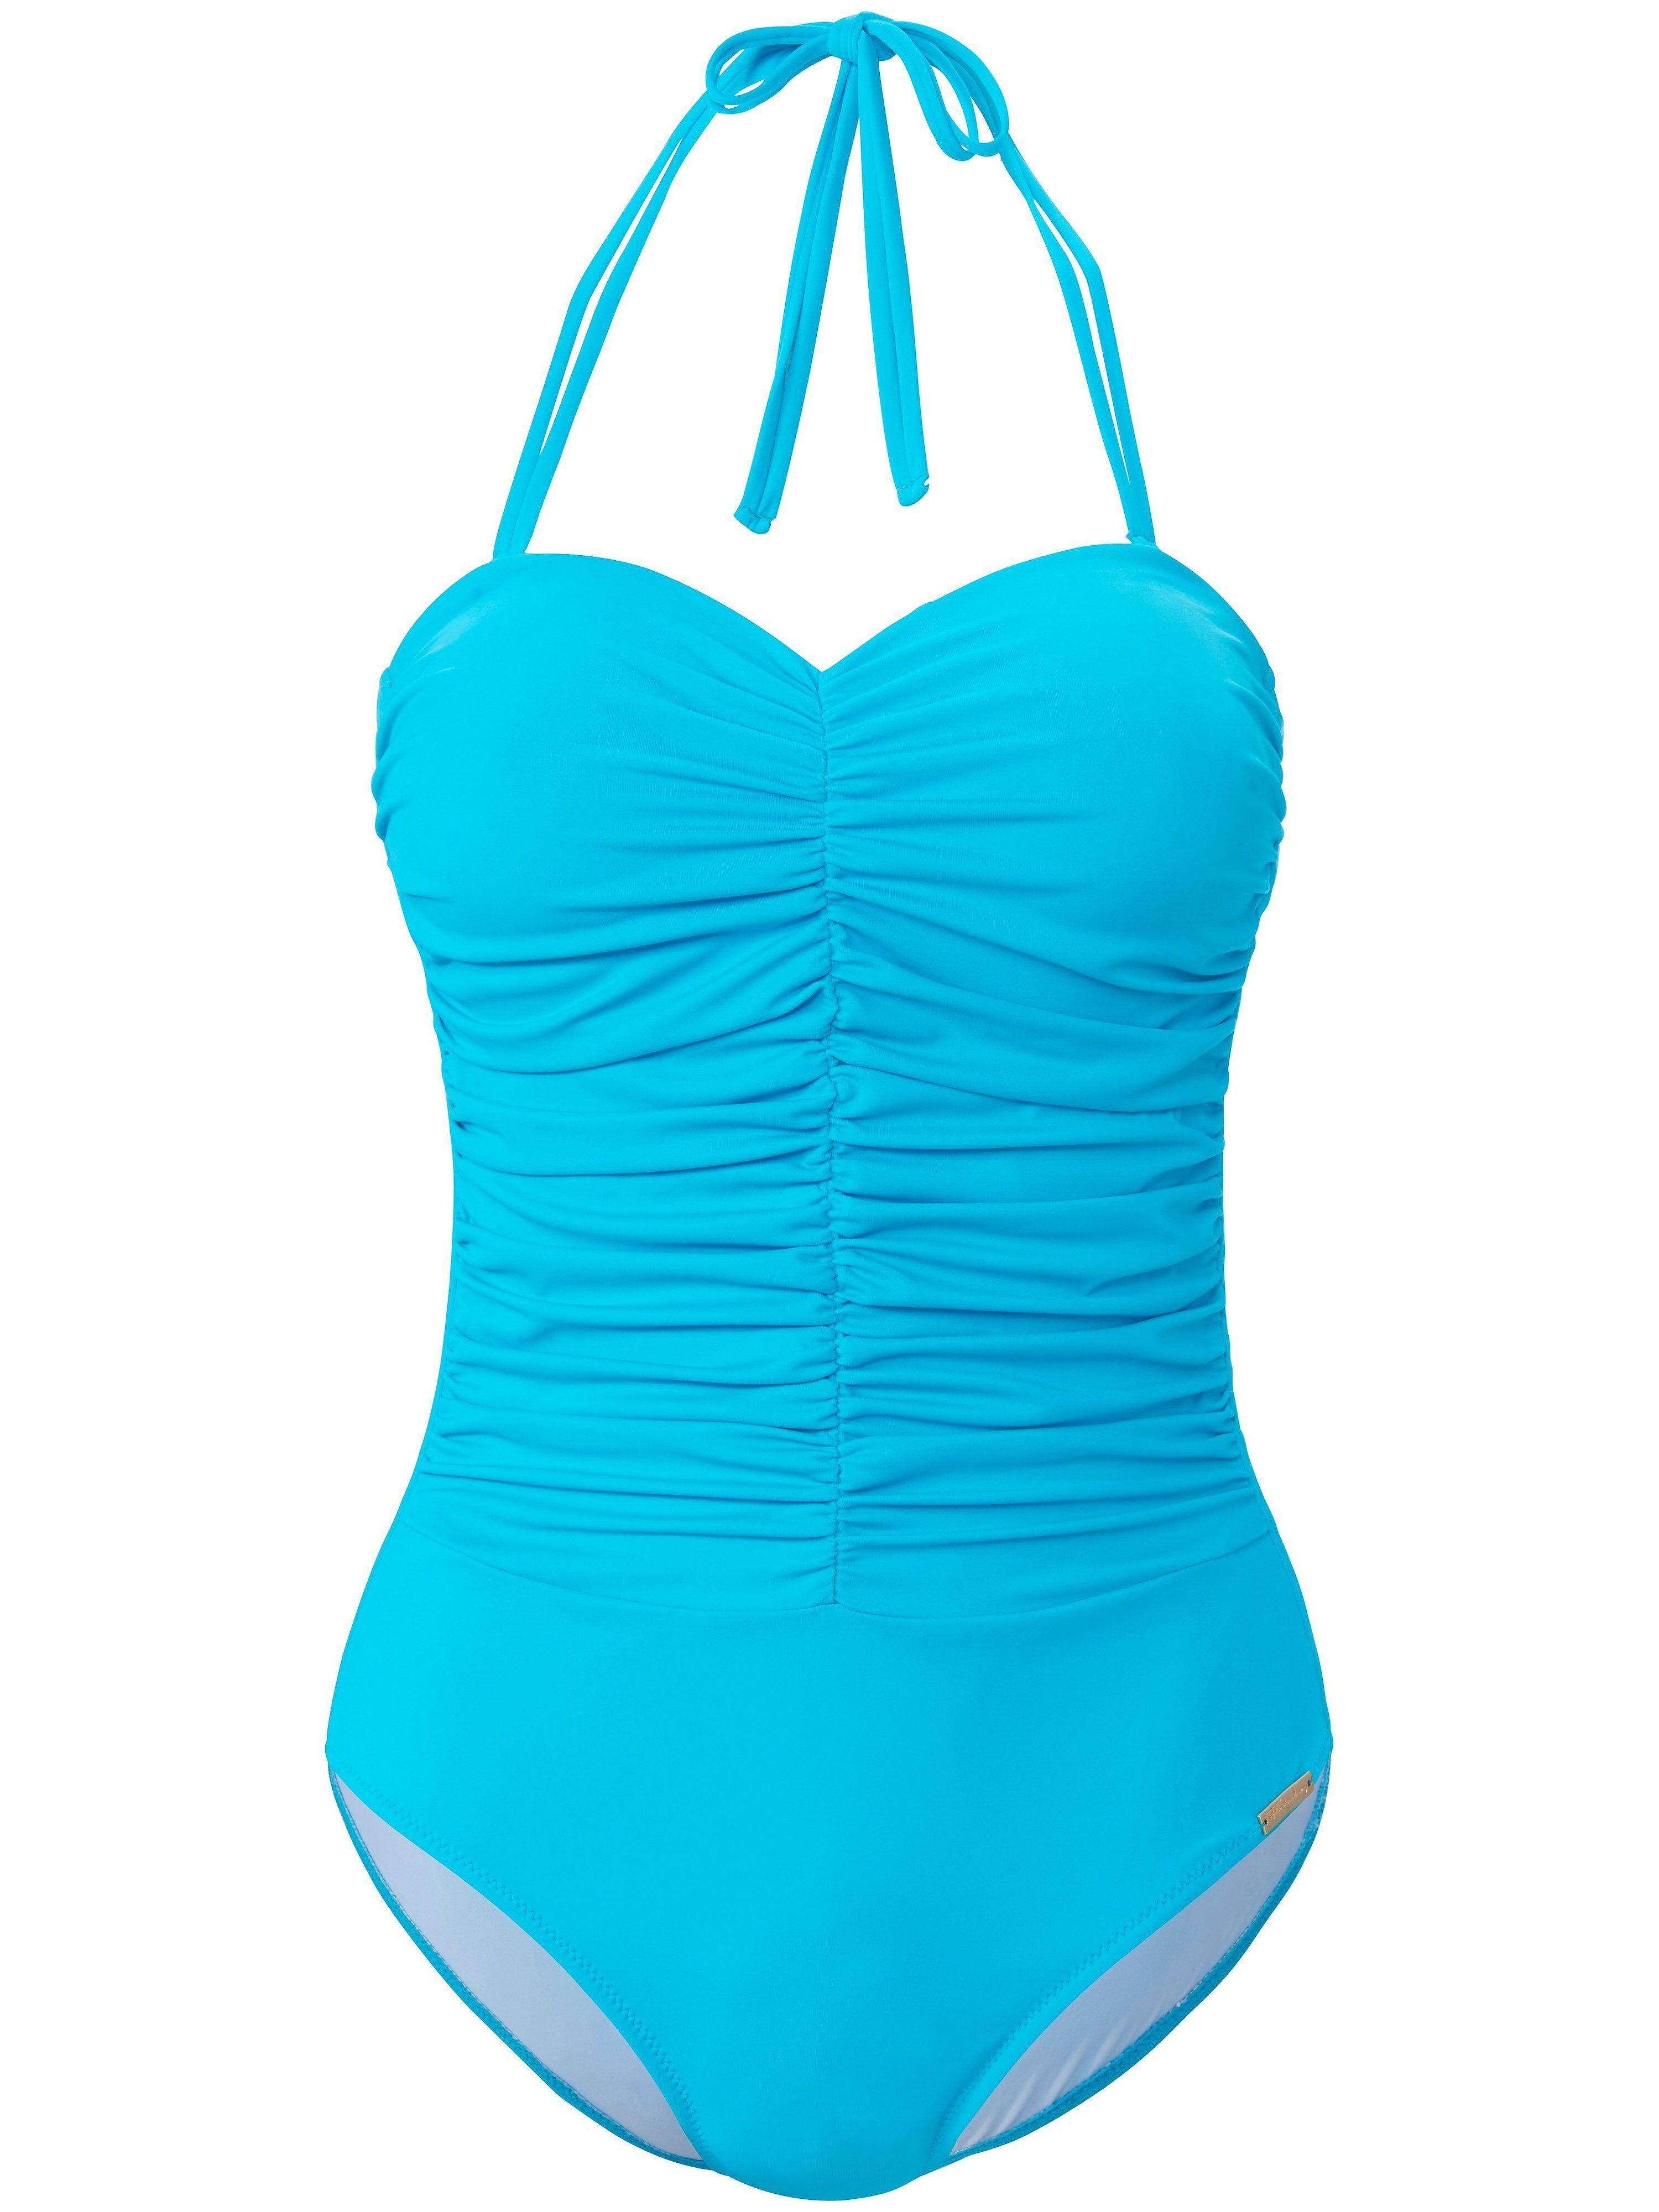 Fürstenberg Le maillot bain forme bandeau  Fürstenberg turquoise  - Femme - 48